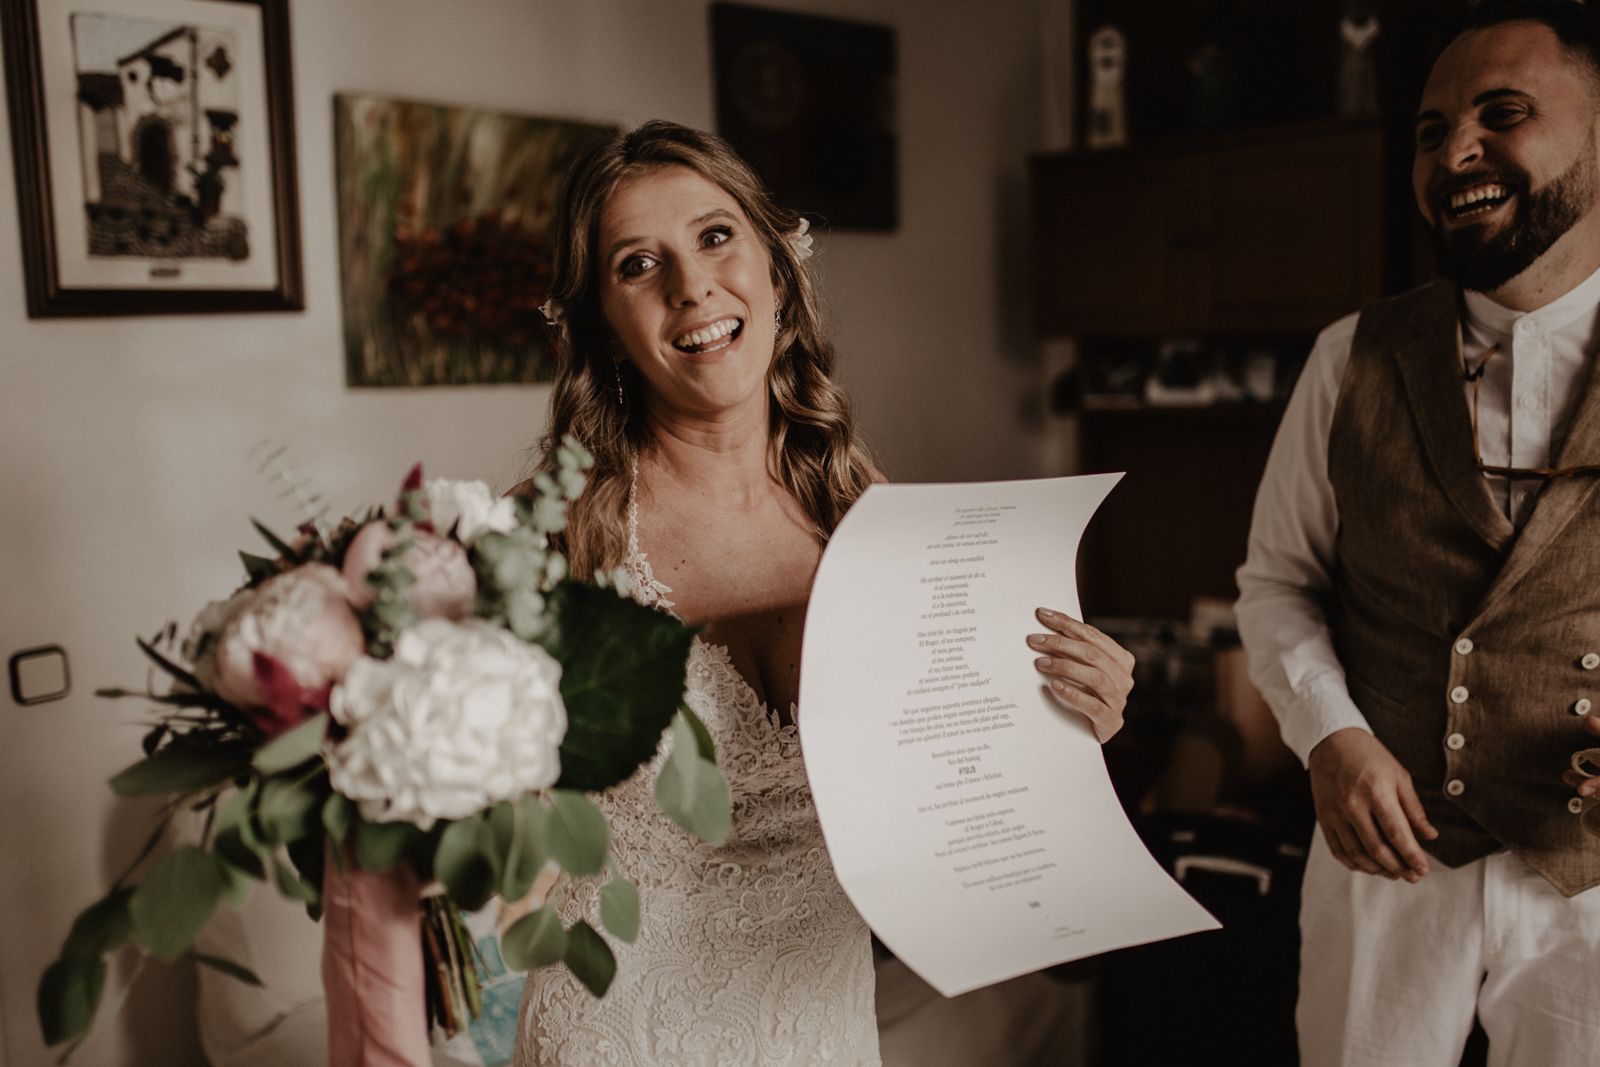 thenortherngirlphotography_photography_thenortherngirl_rebeccascabros_wedding_weddingphotography_weddingphotographer_barcelona_bodaenbarcelona_bodaenmaselmarti_bodarogeryvane-199.jpg